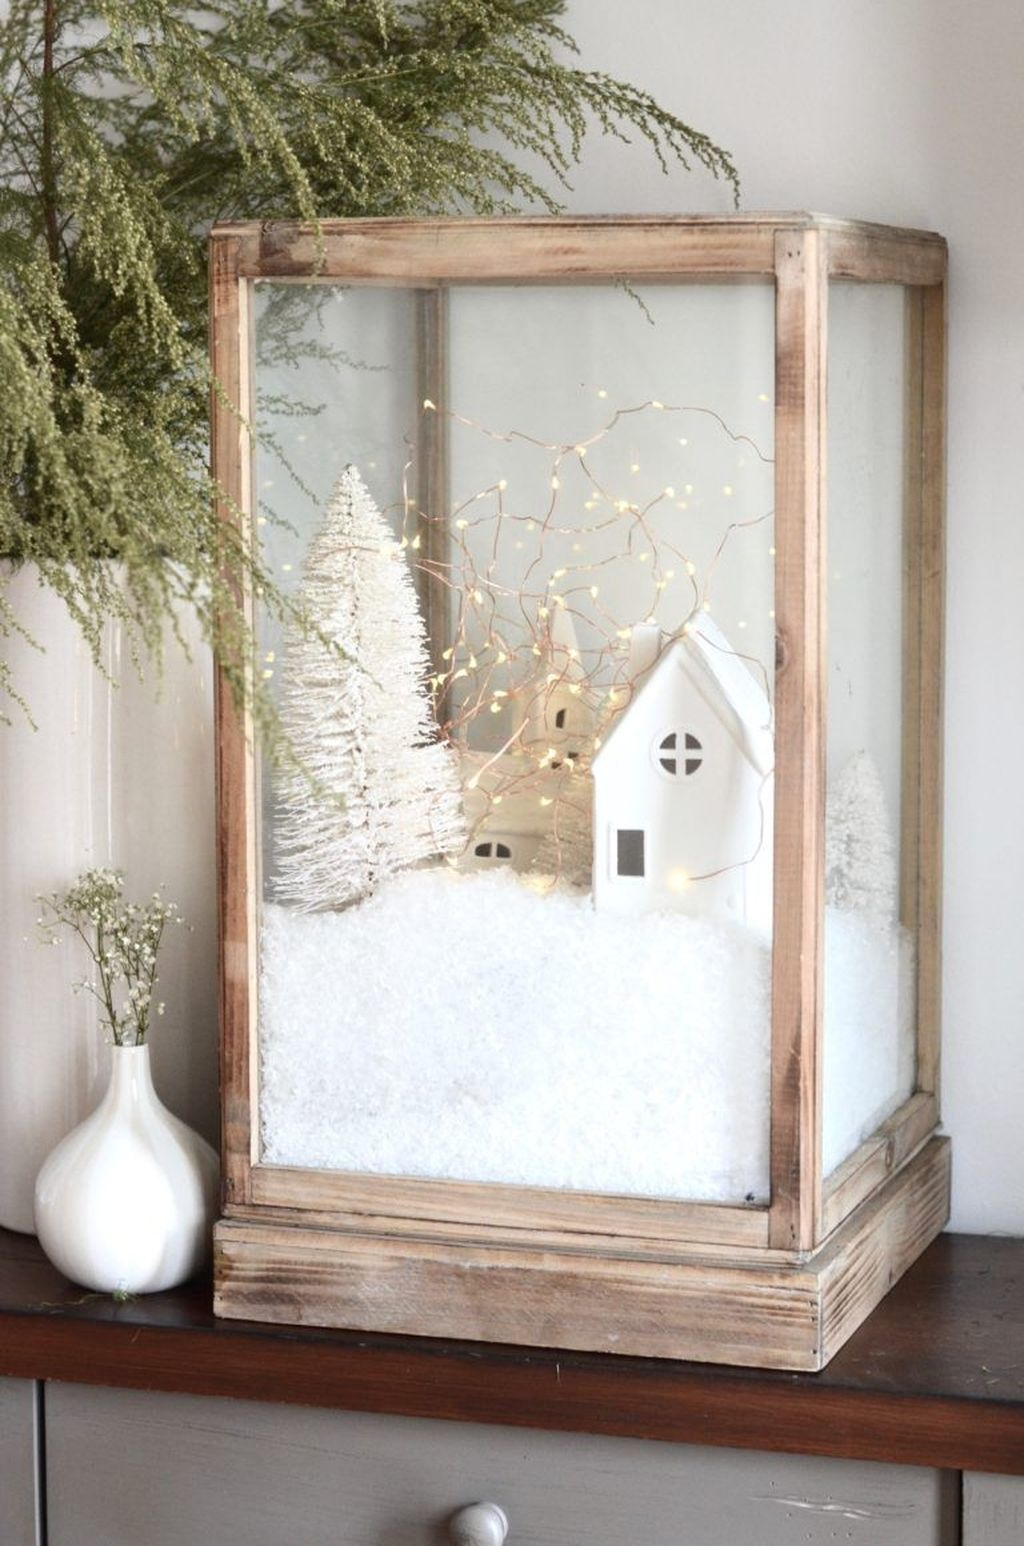 Creative Diy Room Decoration Ideas For Winter 14